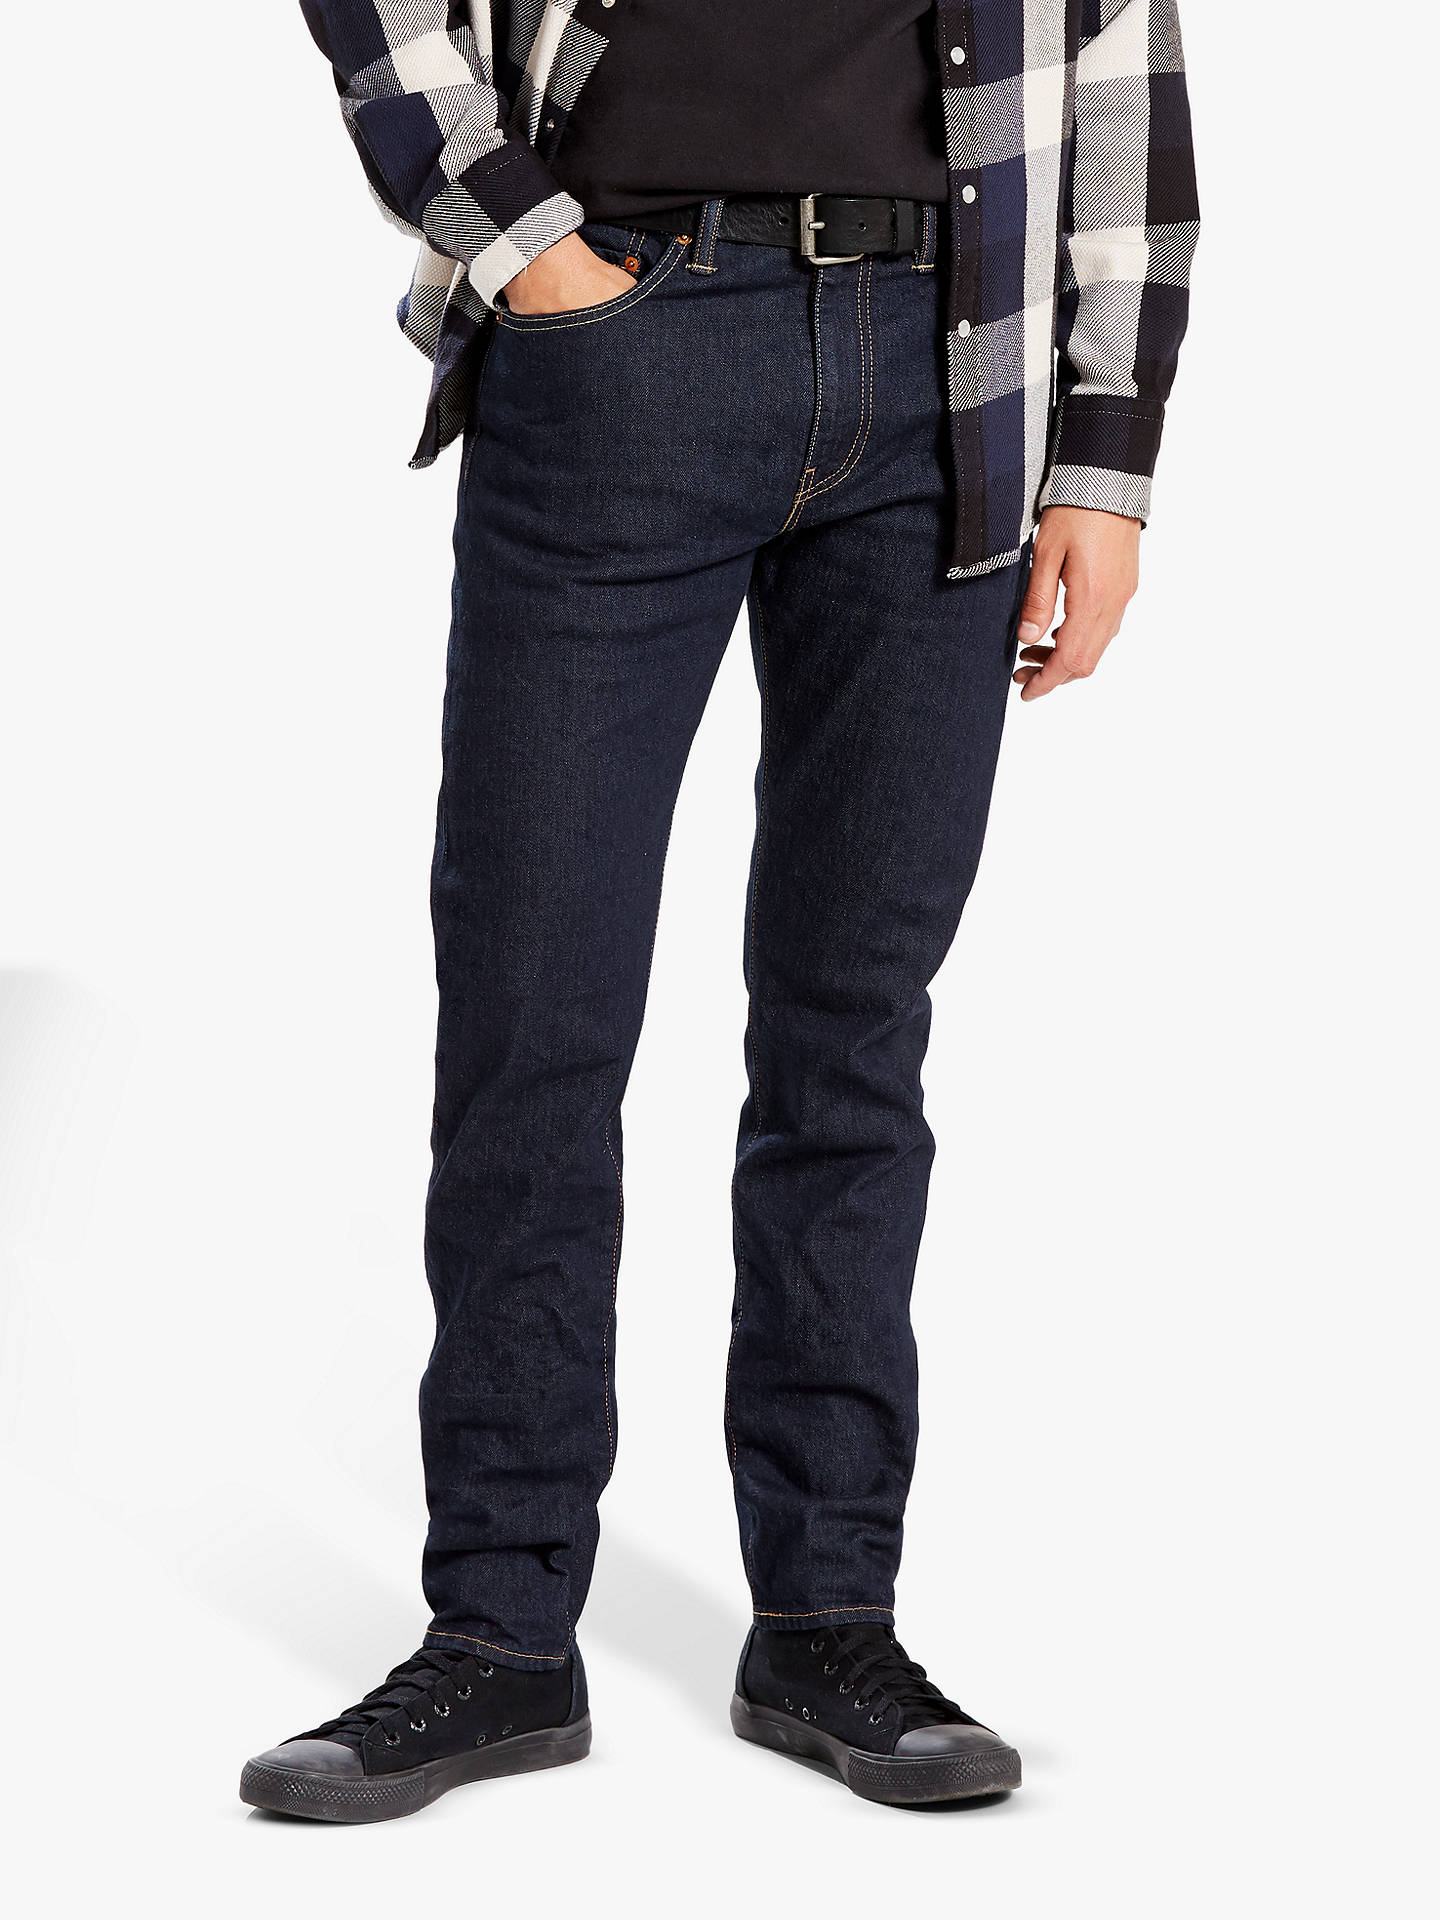 Levi S 512 Slim Tapered Jeans Rock Cod At John Lewis